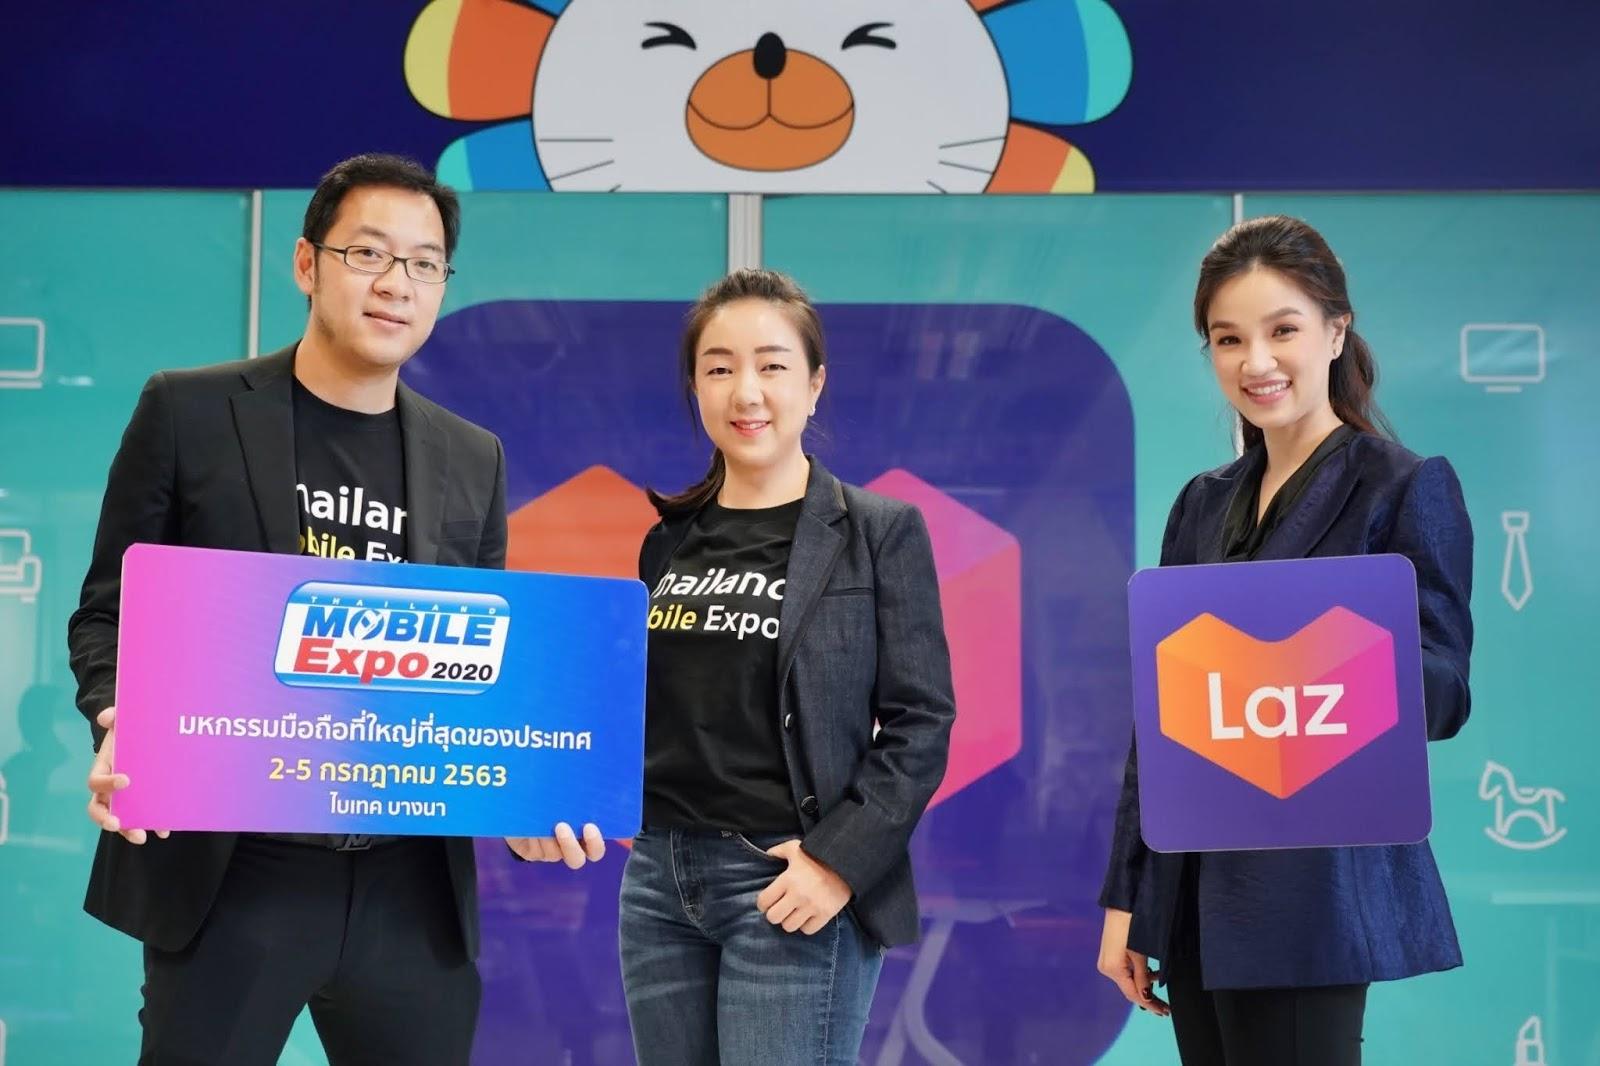 Lazada ผนึกกำลัง MVP จัดงาน Thailand Mobile Expo 2020 ช้อปออนไลน์ได้ทุกที่ทั่วไทย 24 ชั่วโมง เป็นครั้งแรก พร้อมแจกคูปองส่วนลดรวมกว่า 4 ล้านบาท